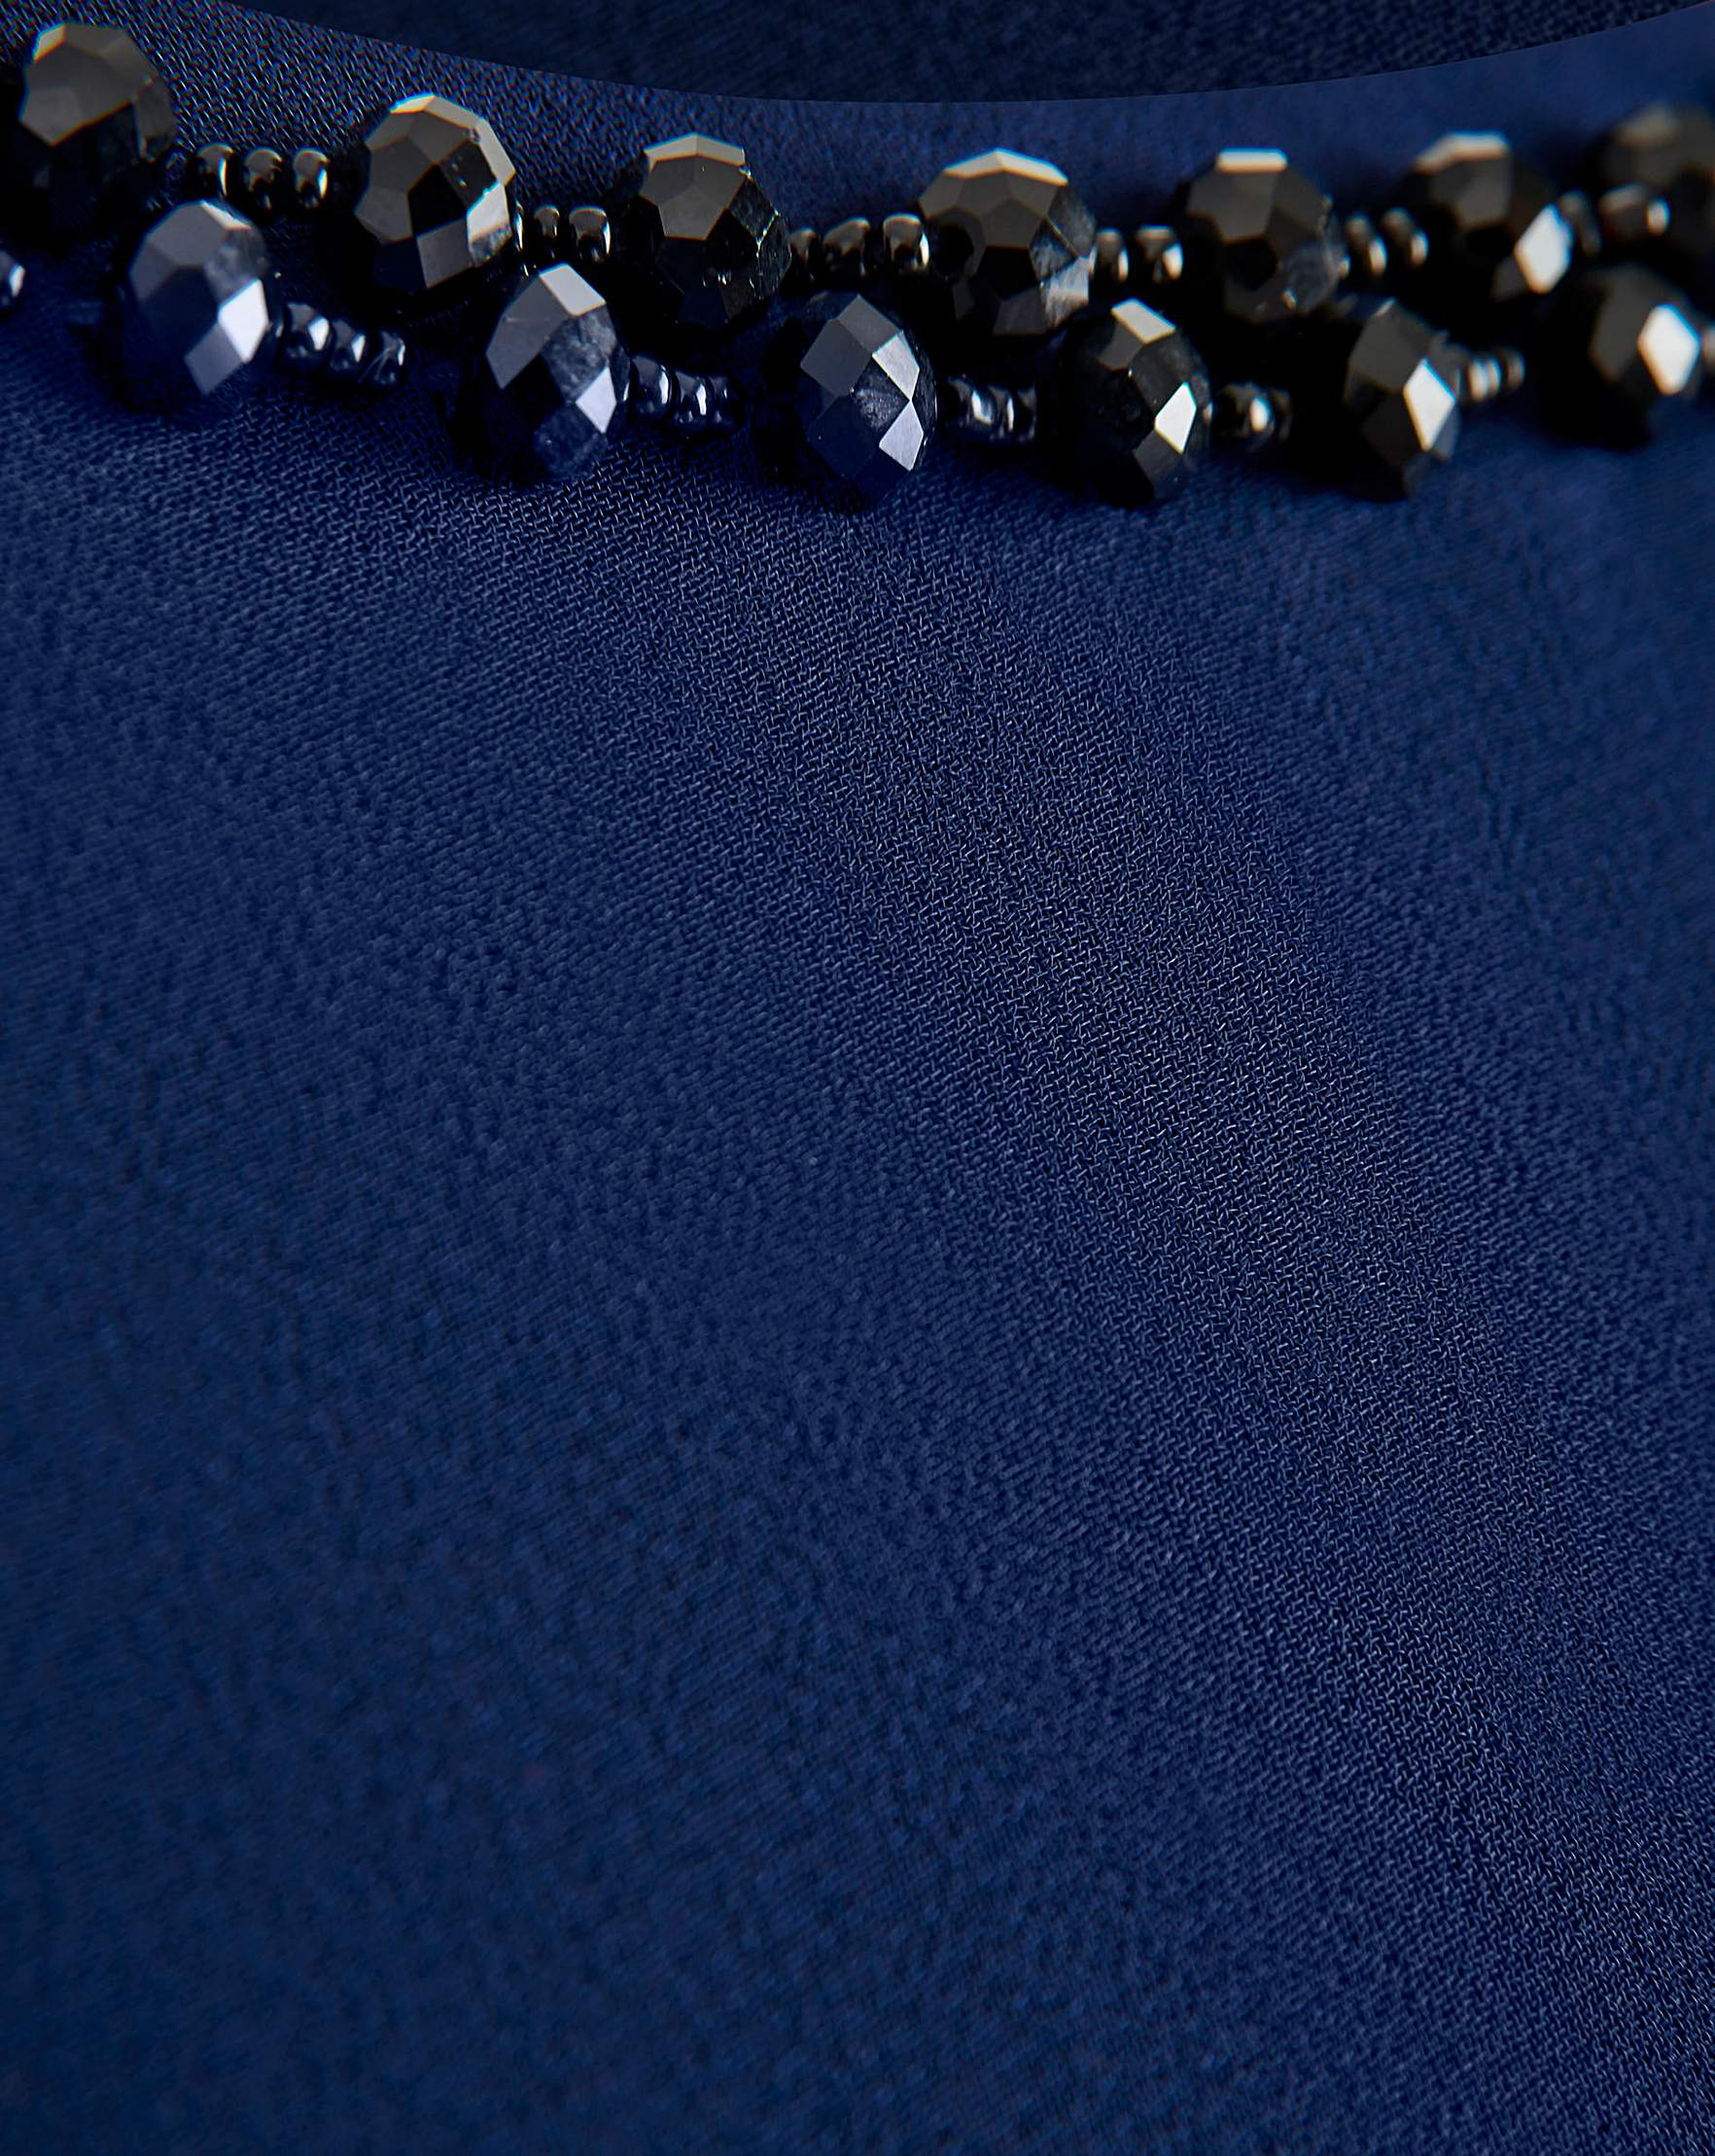 6d5715829347 Joanna Hope - - Joanna Hope NAVY Jewel Trim Swing Dress - Plus Size 12 to 32